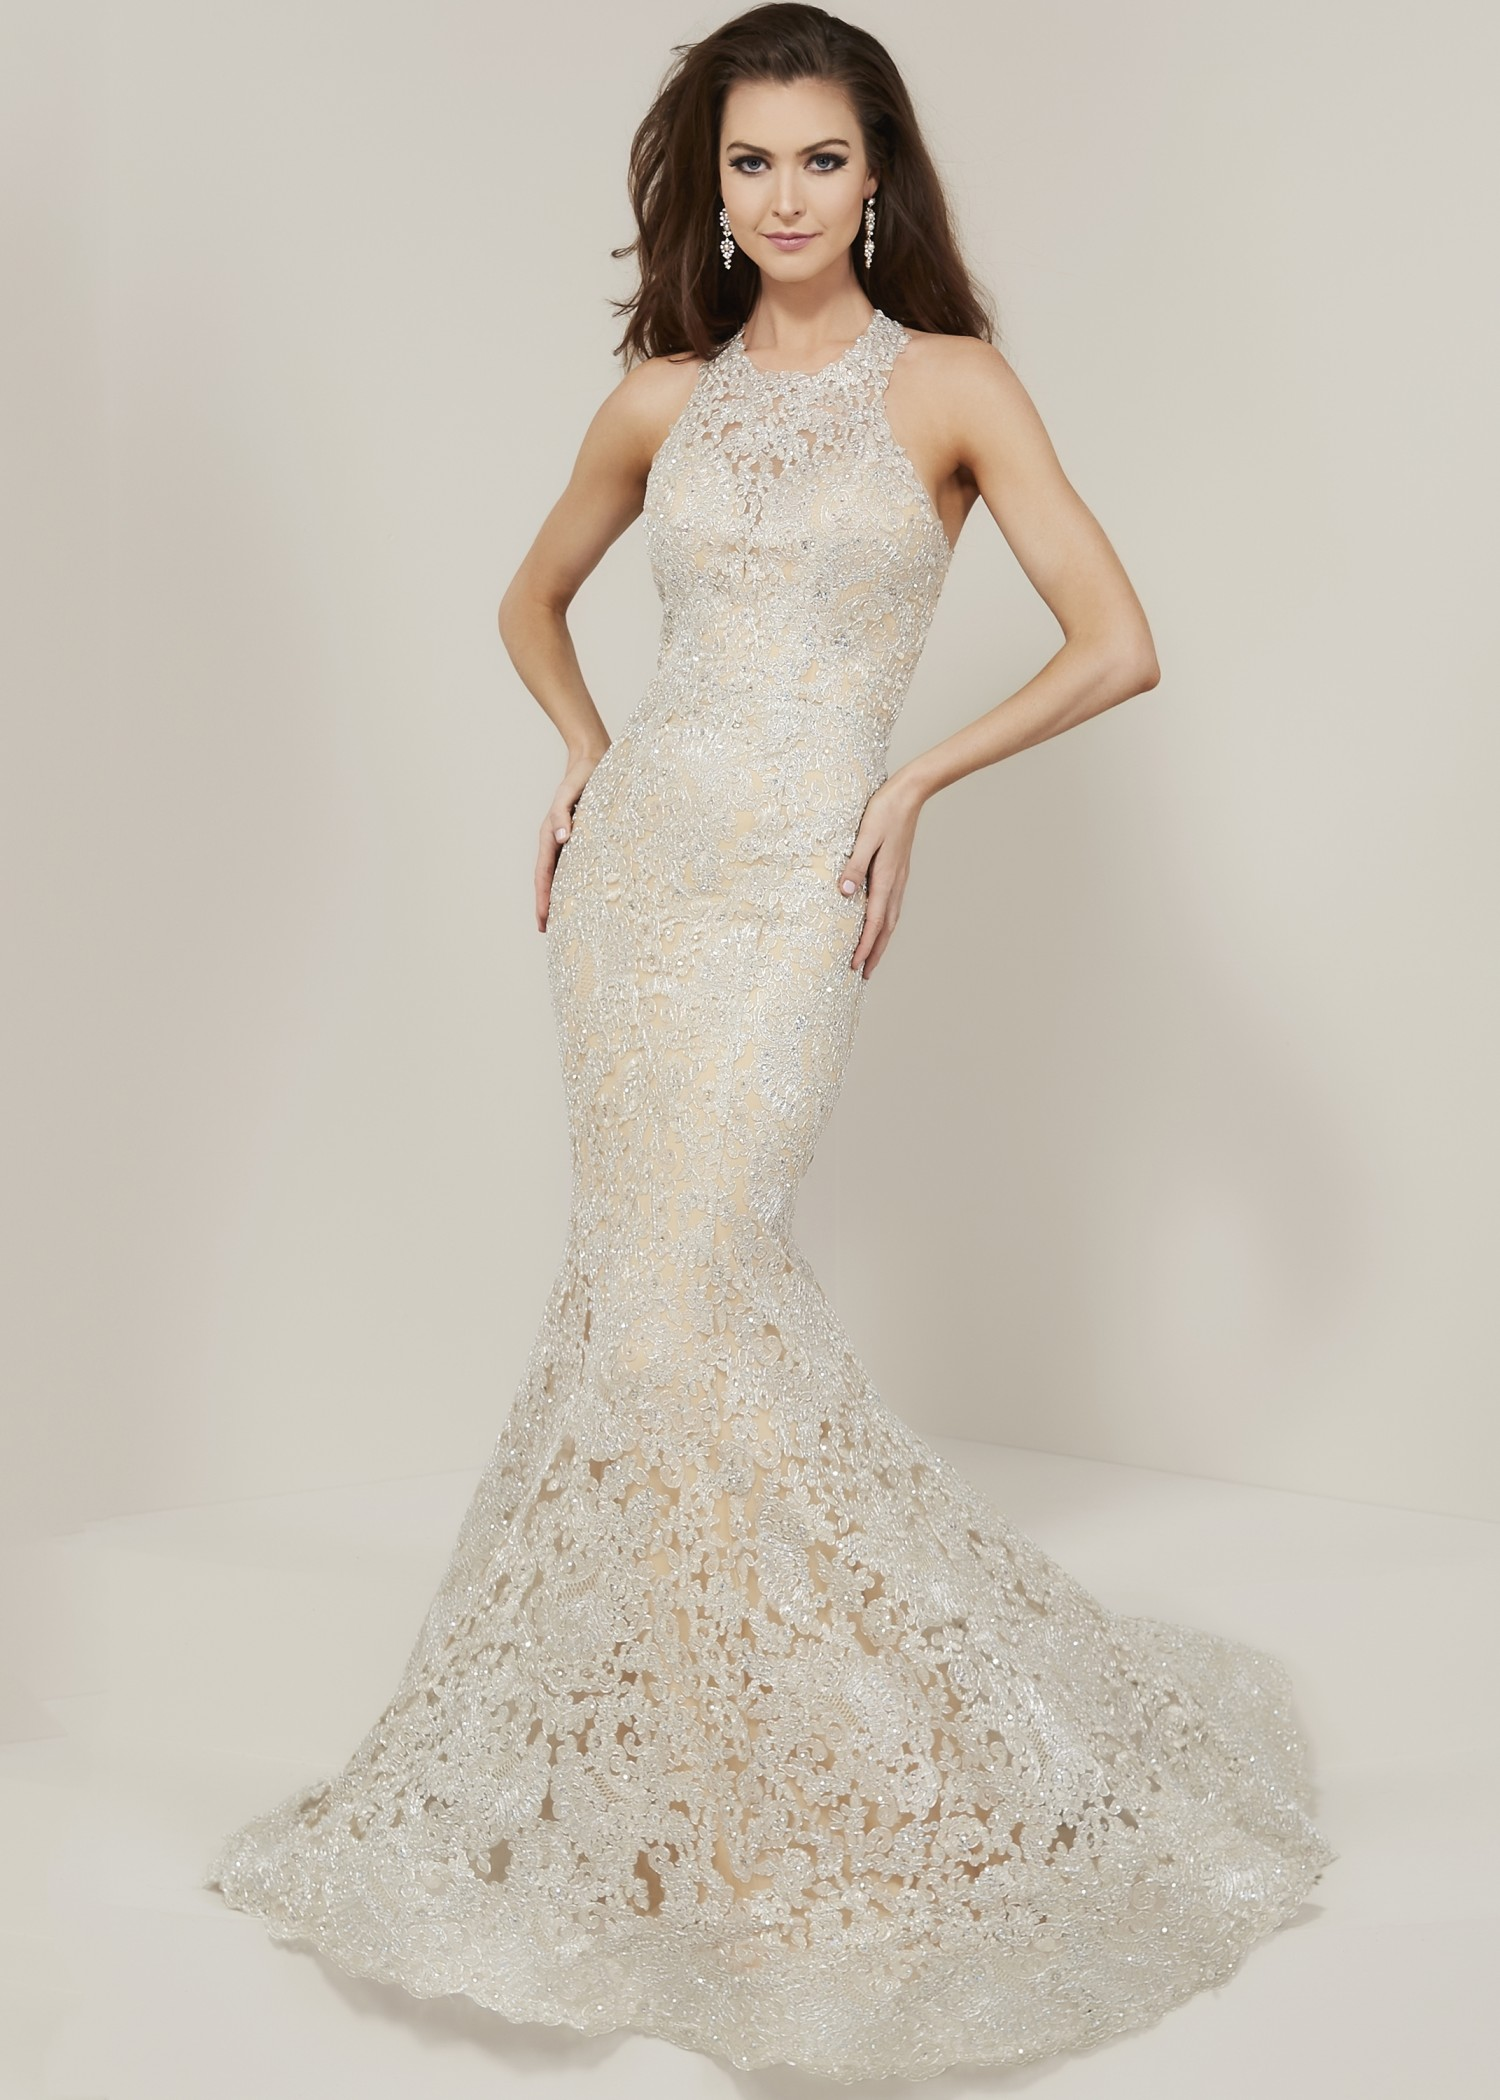 Tiffany Designs 16329 Lace Racerback Dress